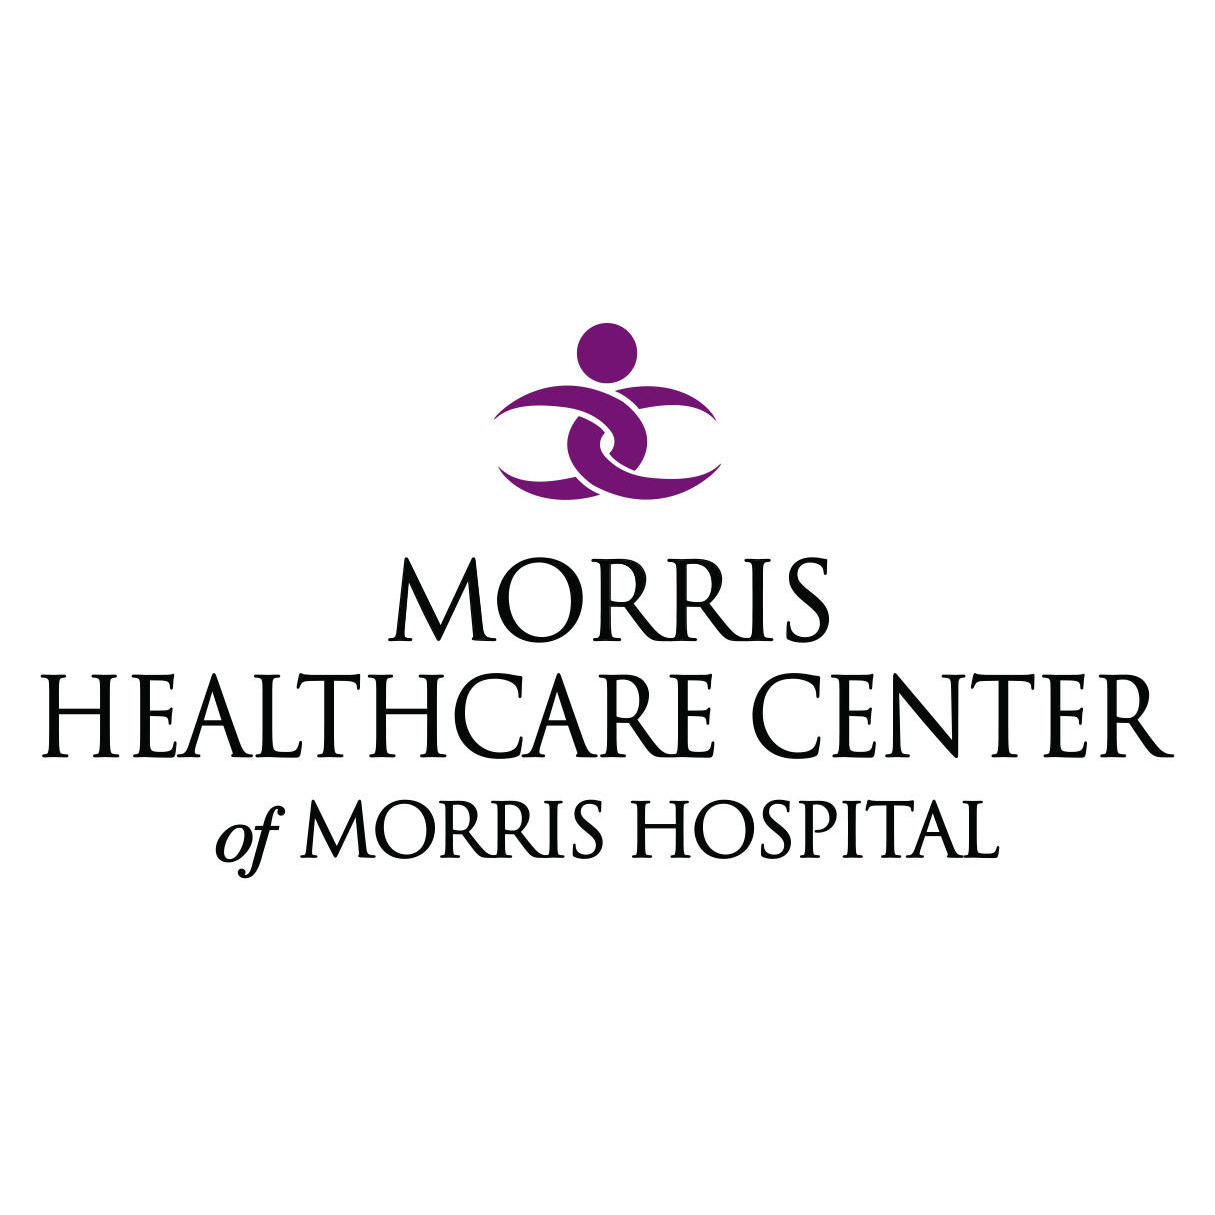 Morris Healthcare Center of Morris Hospital - East Route 6